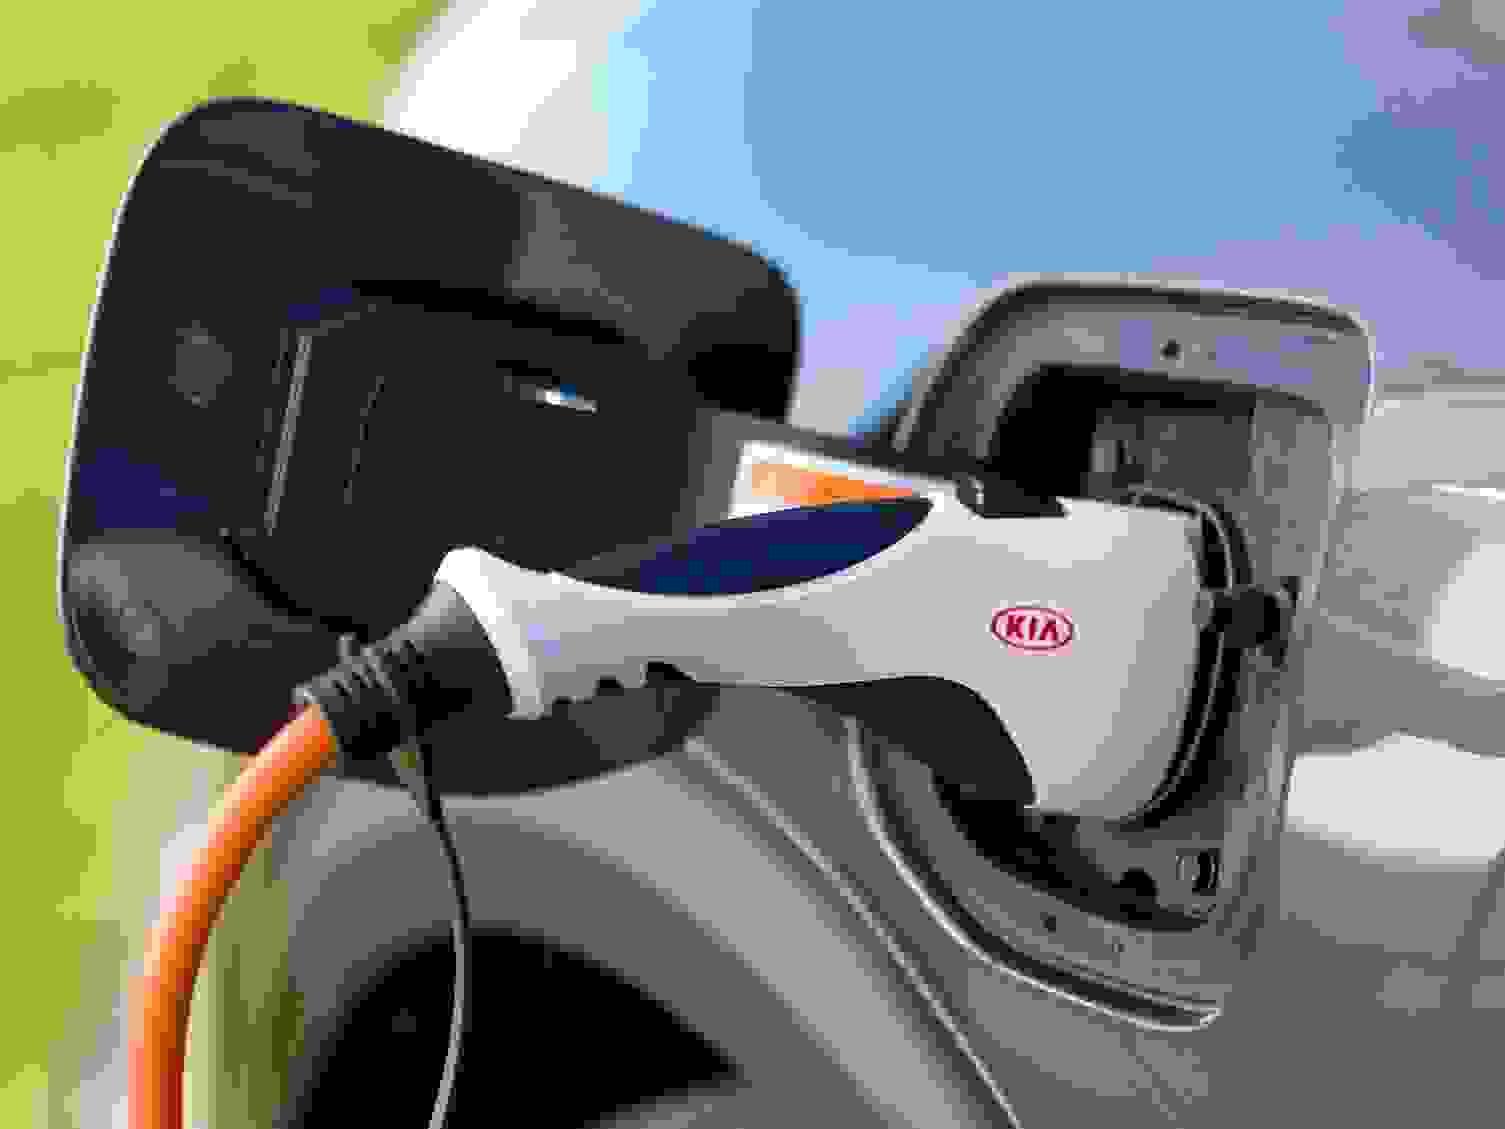 Kia Niro 2018 Eksterior Ladekabel Plug In Hybrid Elektrisk